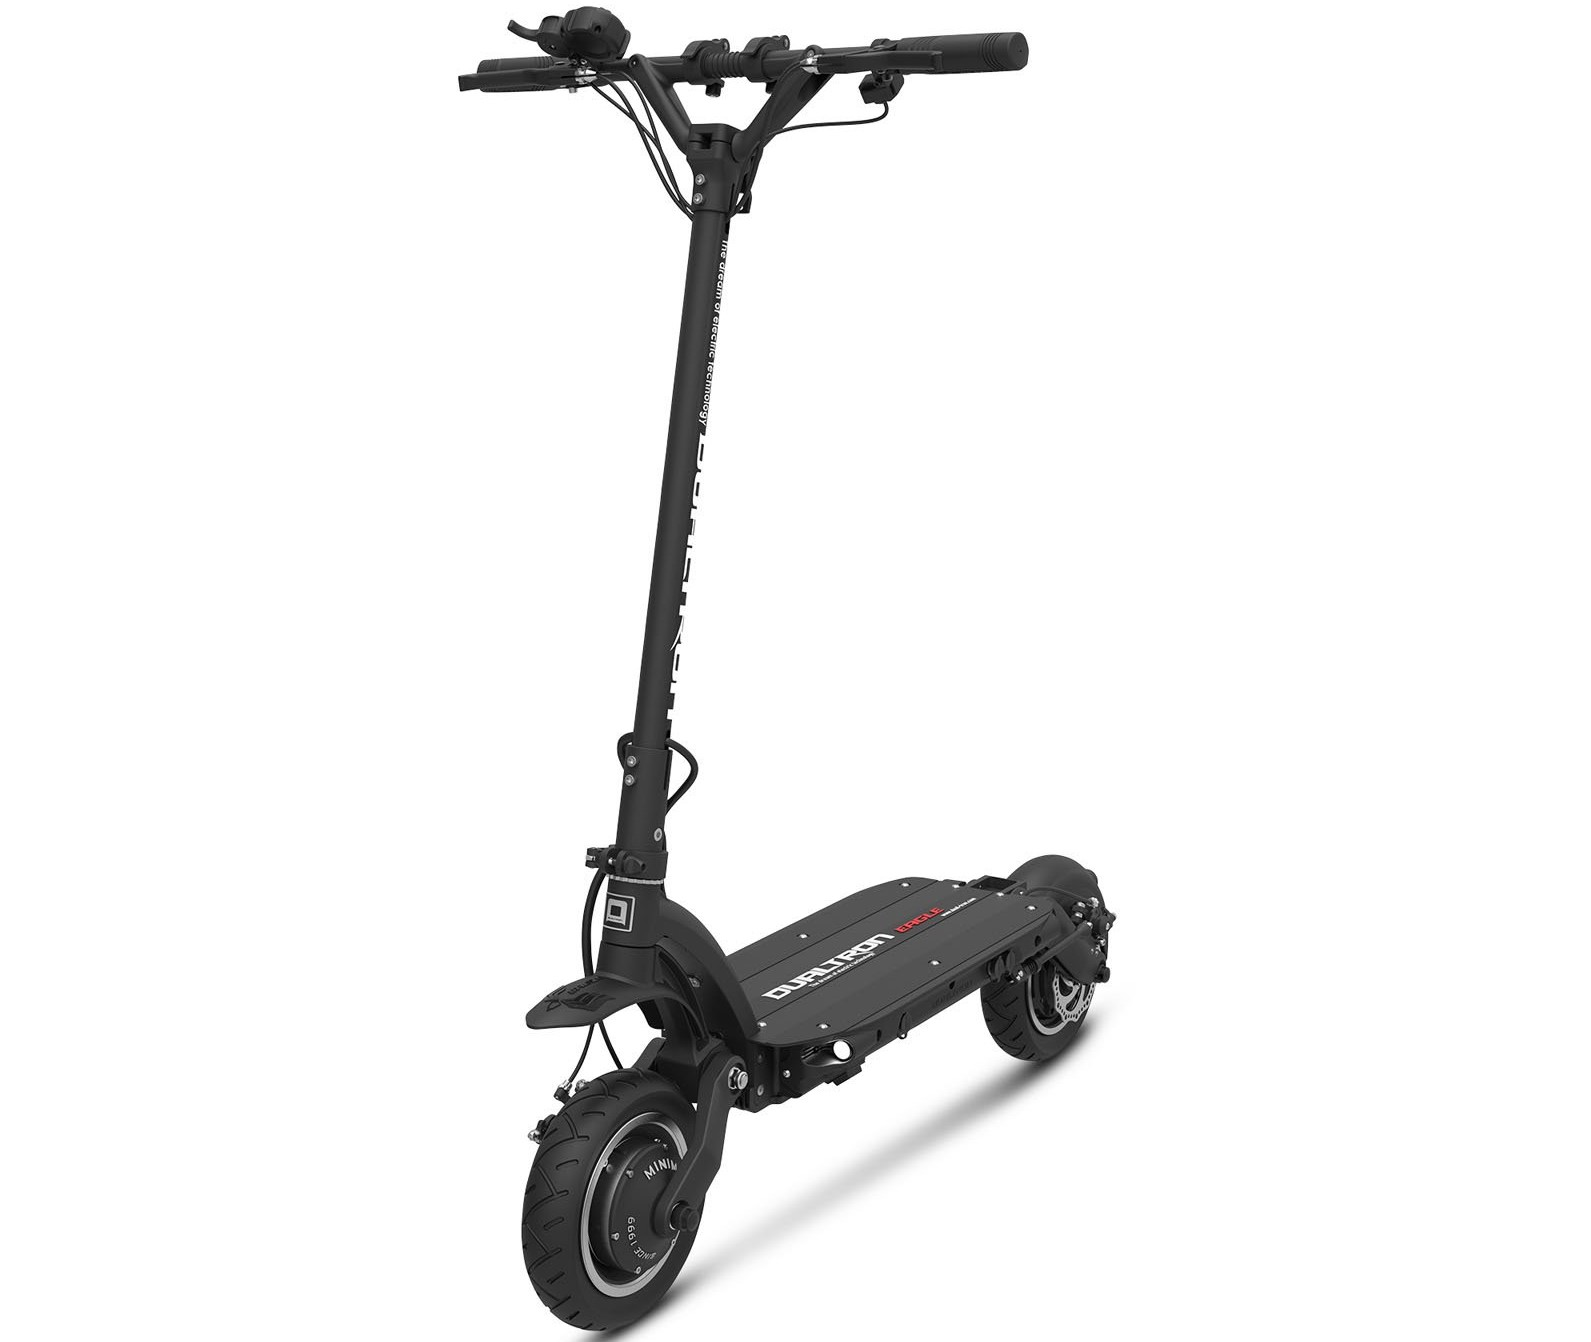 Dualtron Eagle Pro scooter